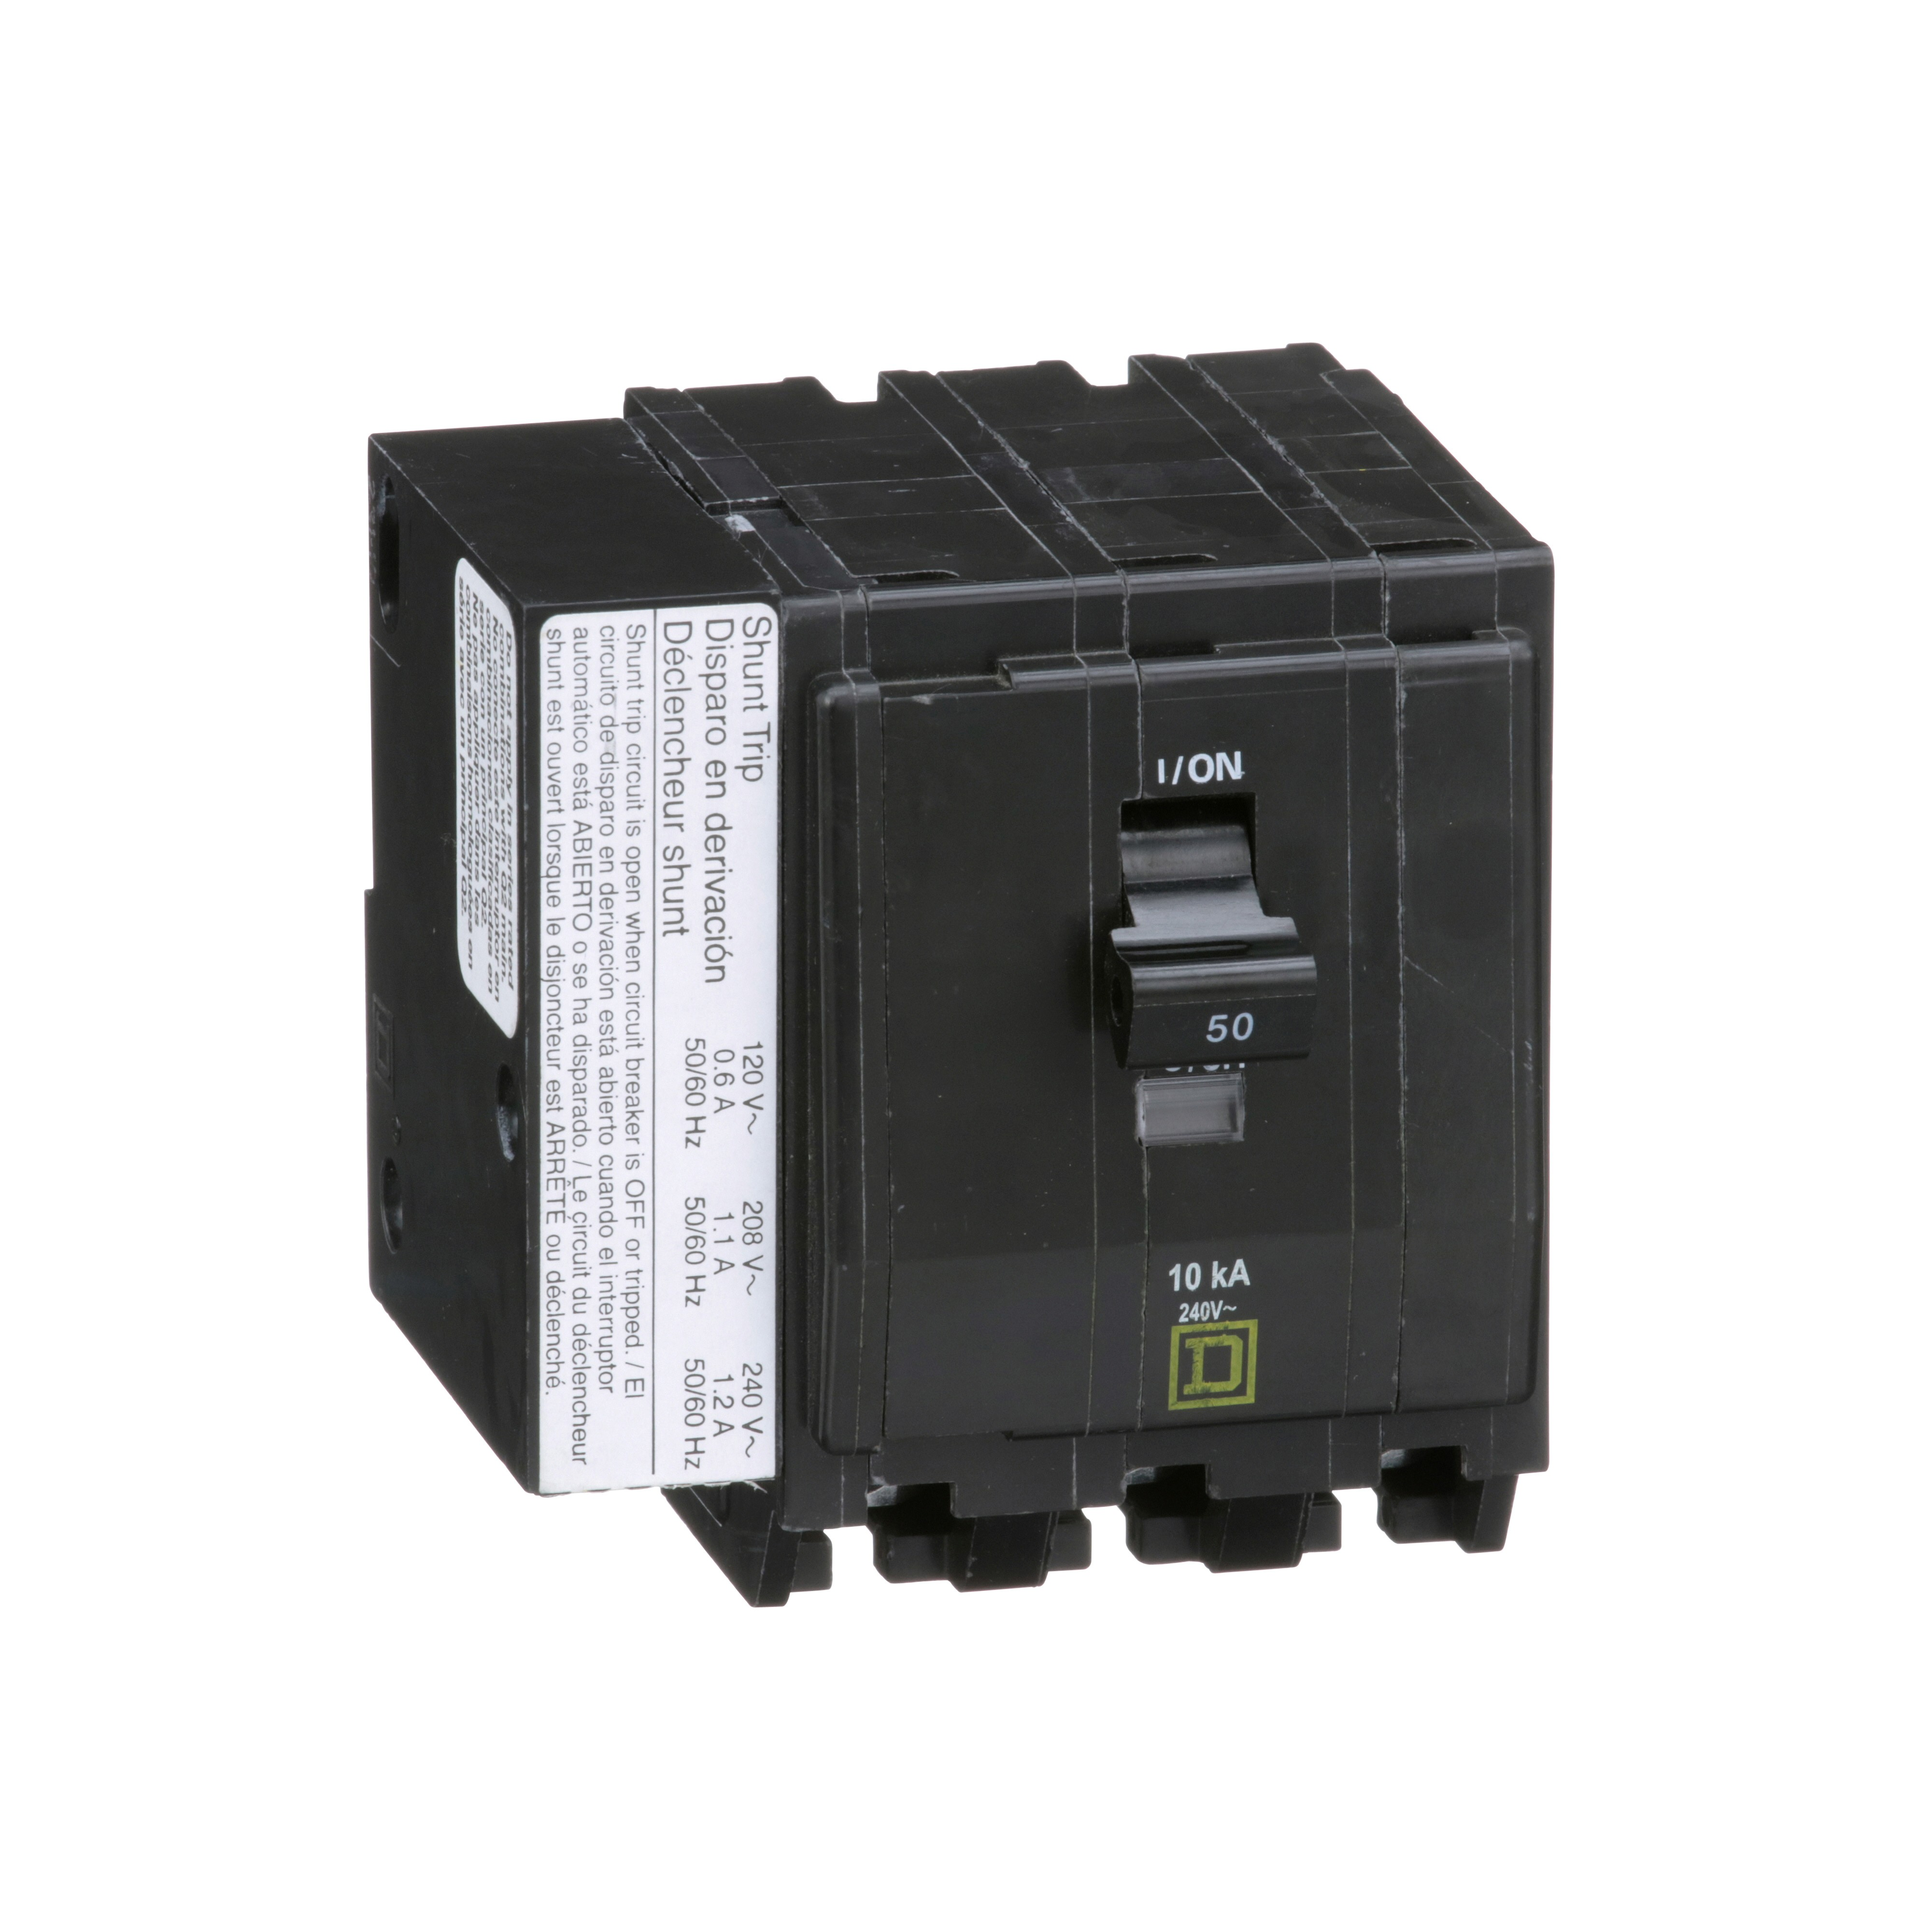 60 Amp Gfi Disconnect New